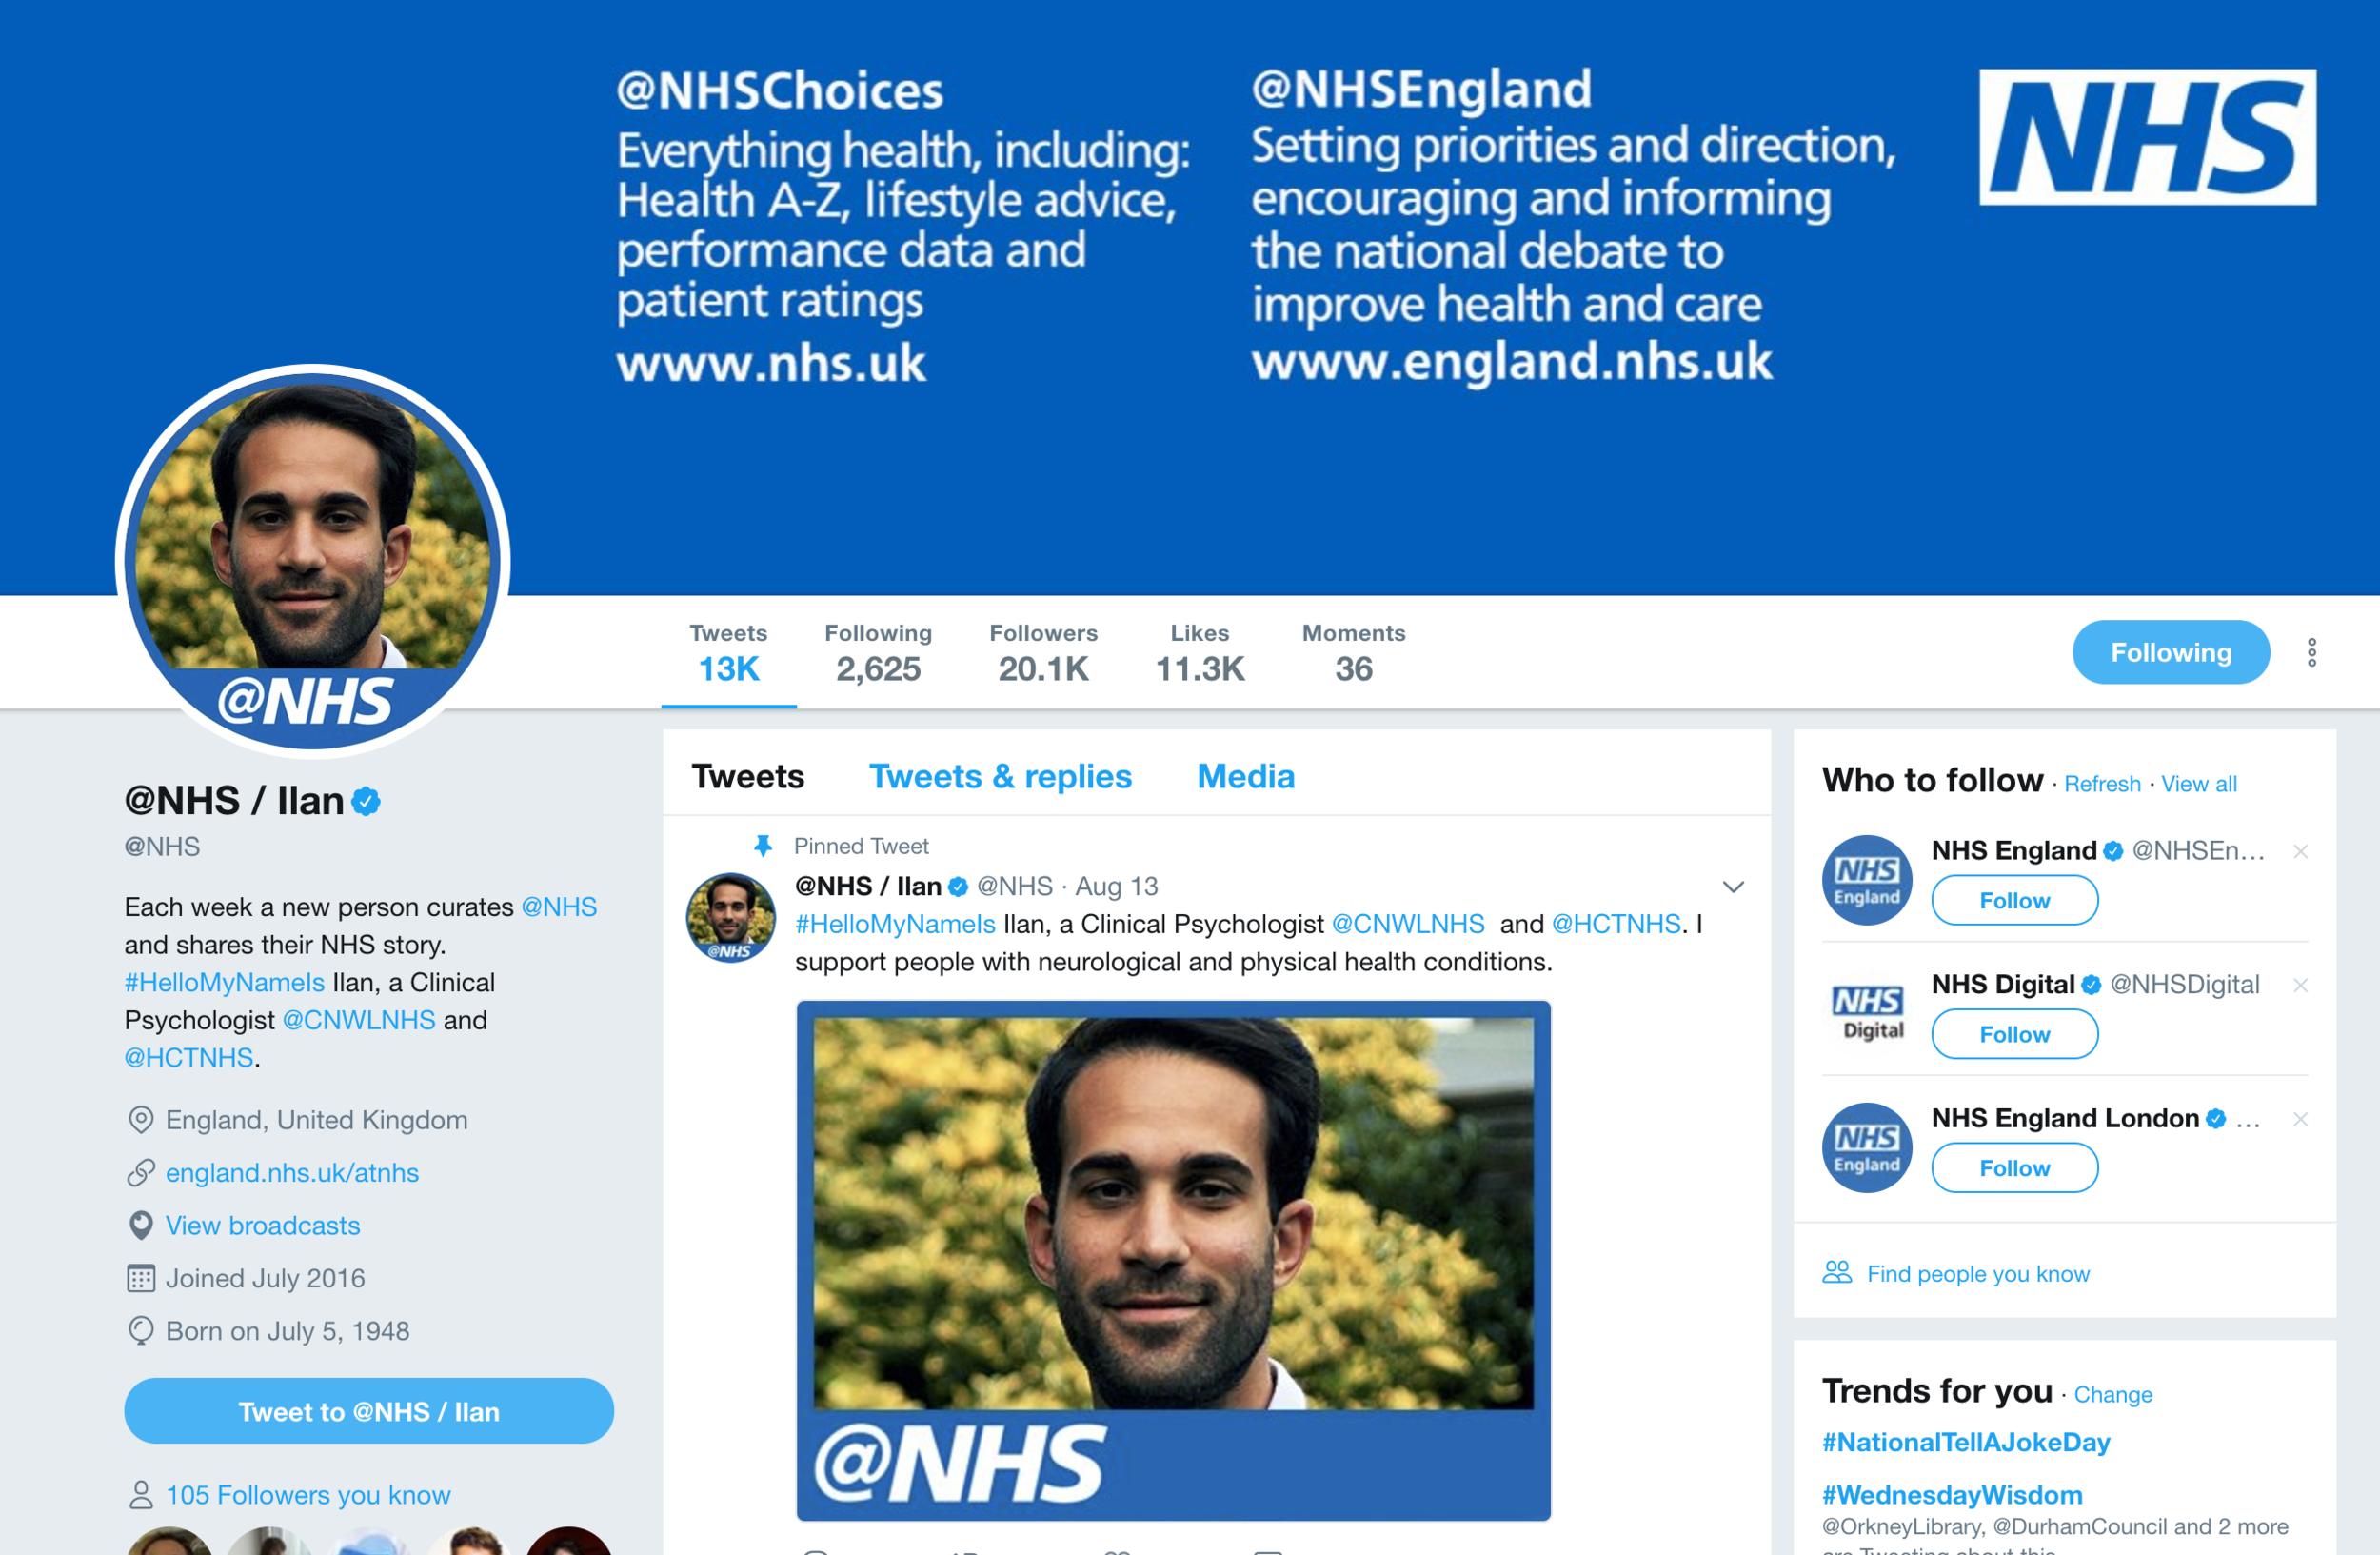 NHS_Twitter_Birdsong_Consultancy